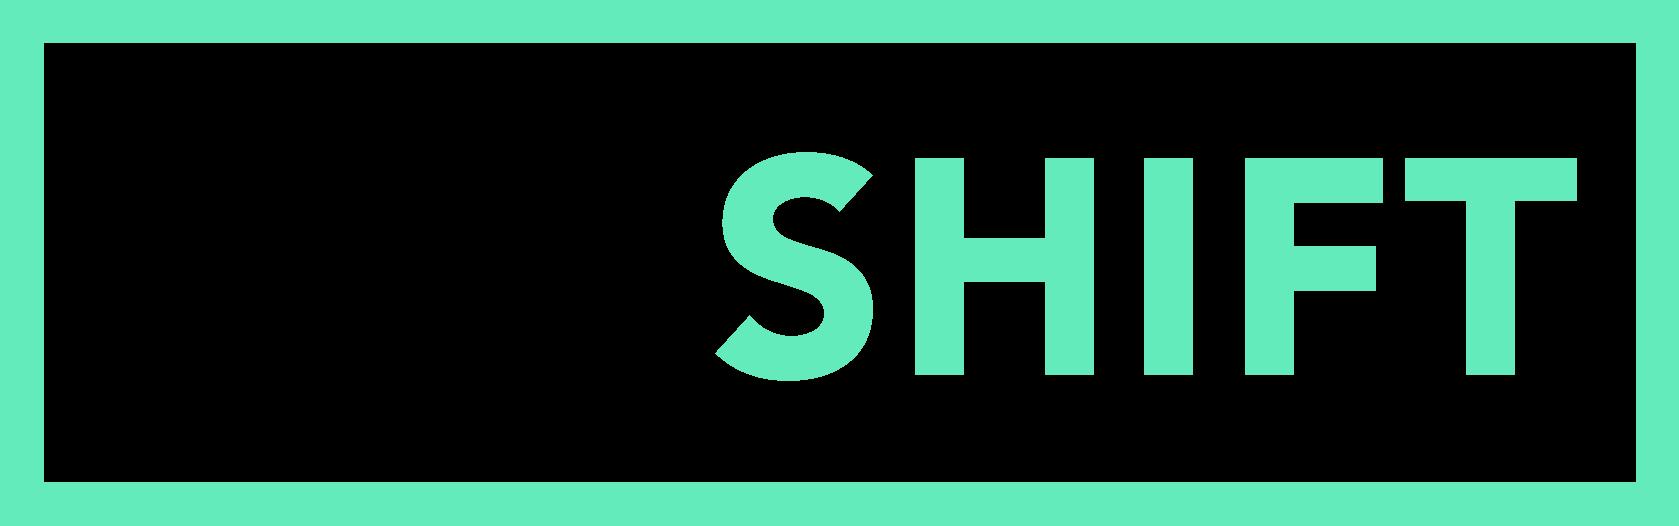 Shift_Logo_Green_RGB.png